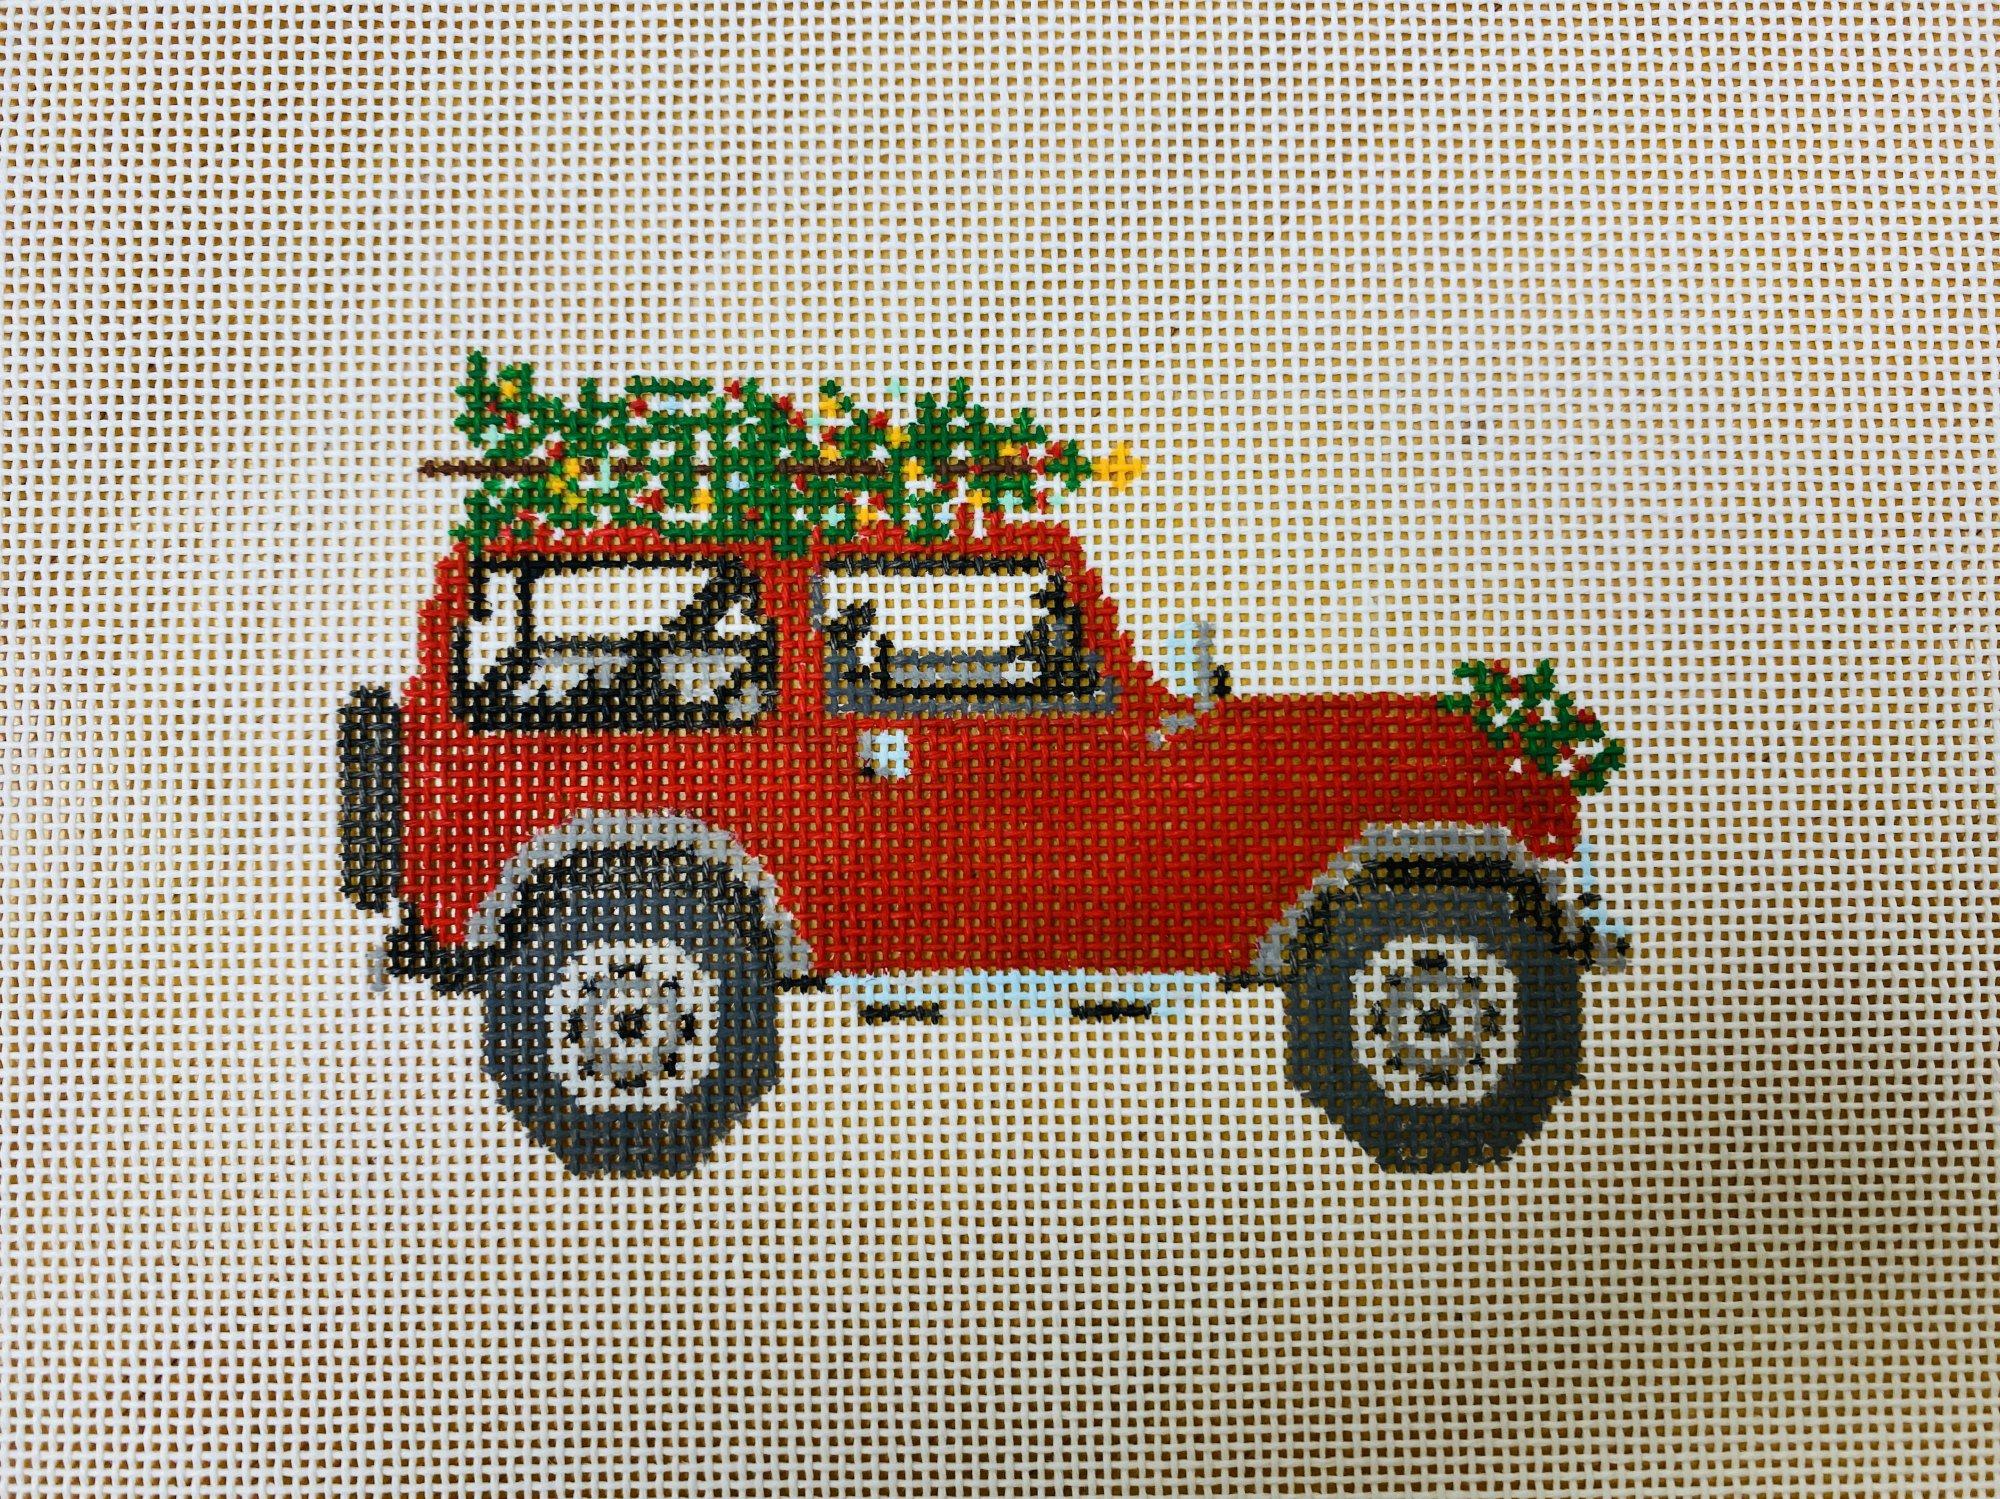 jeep, holiday